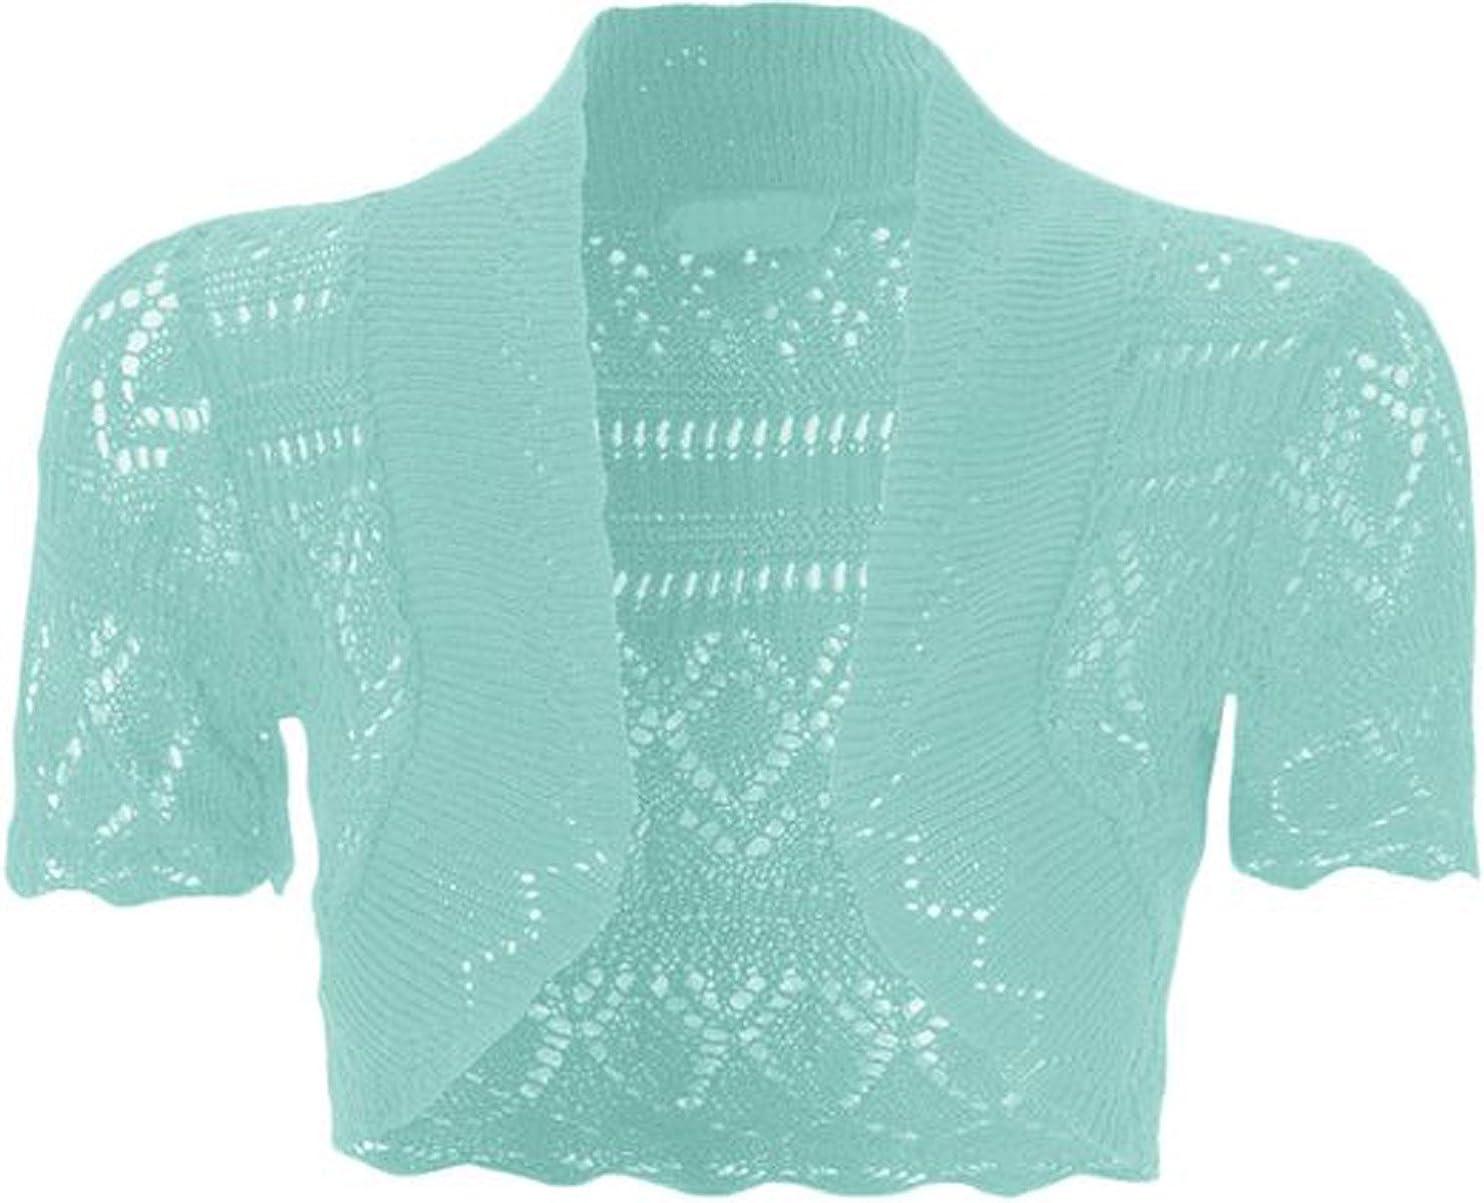 FashionMark Womens Crochet Knitted Bolero Short Sleeve Shrug